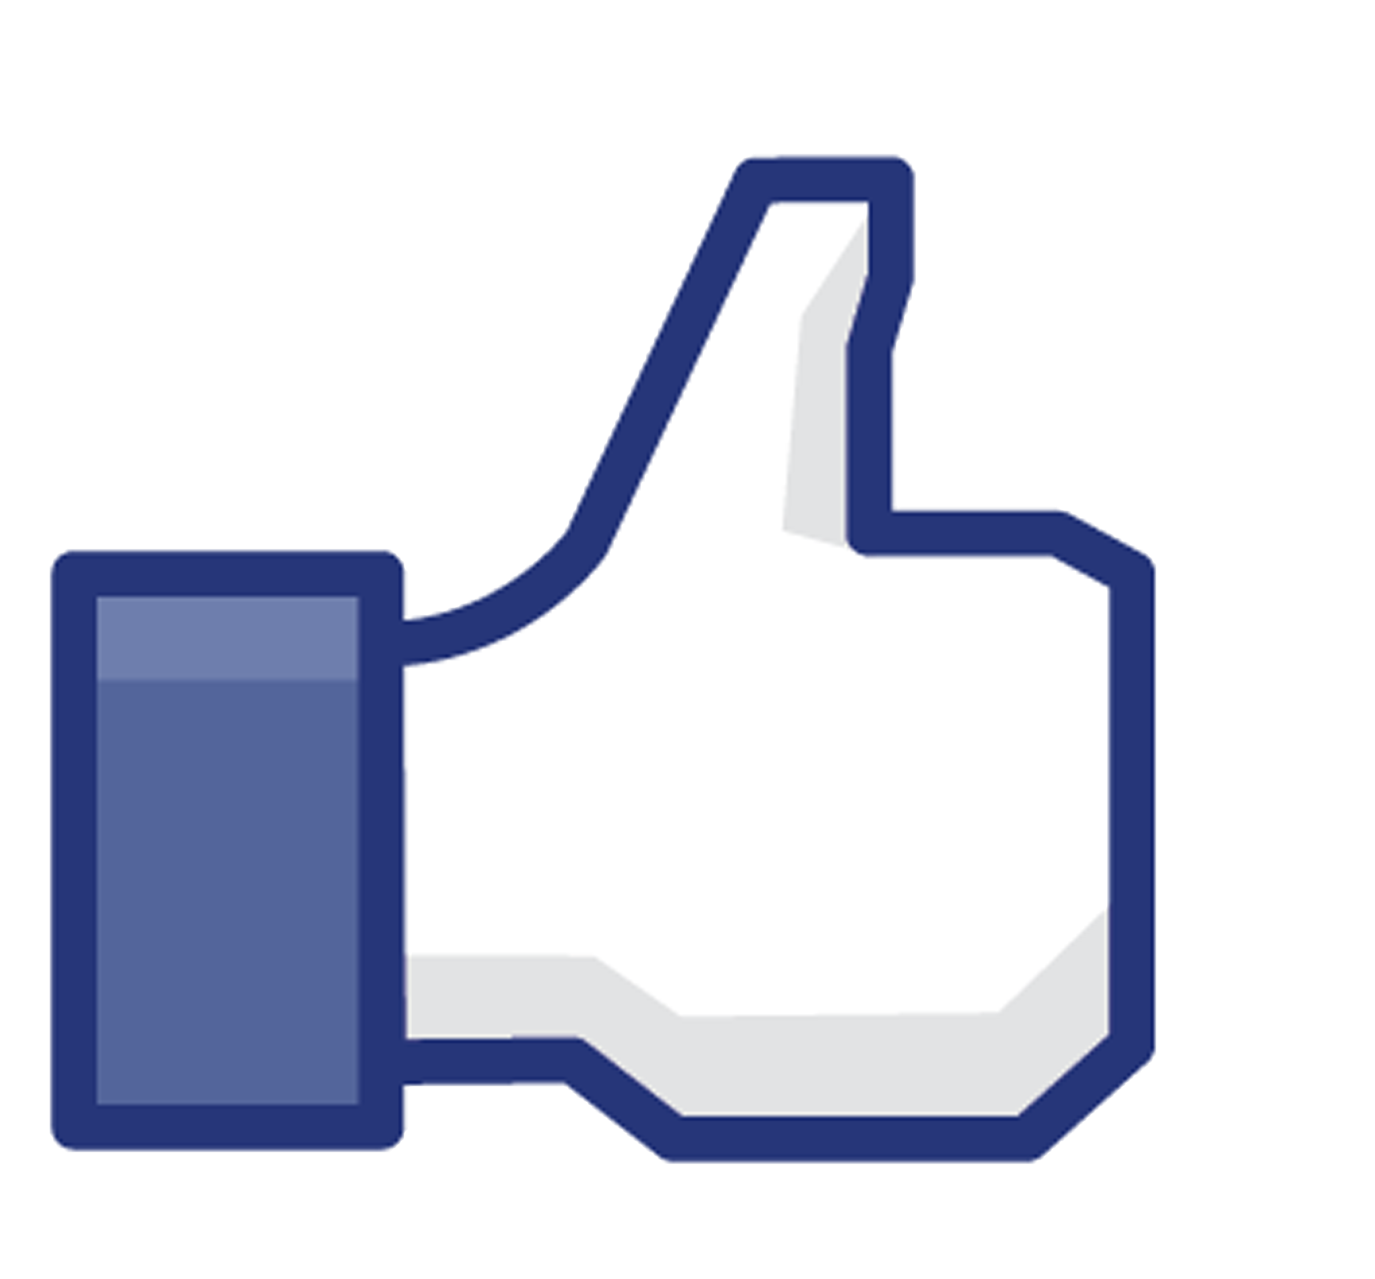 Facebook Png PNG Image